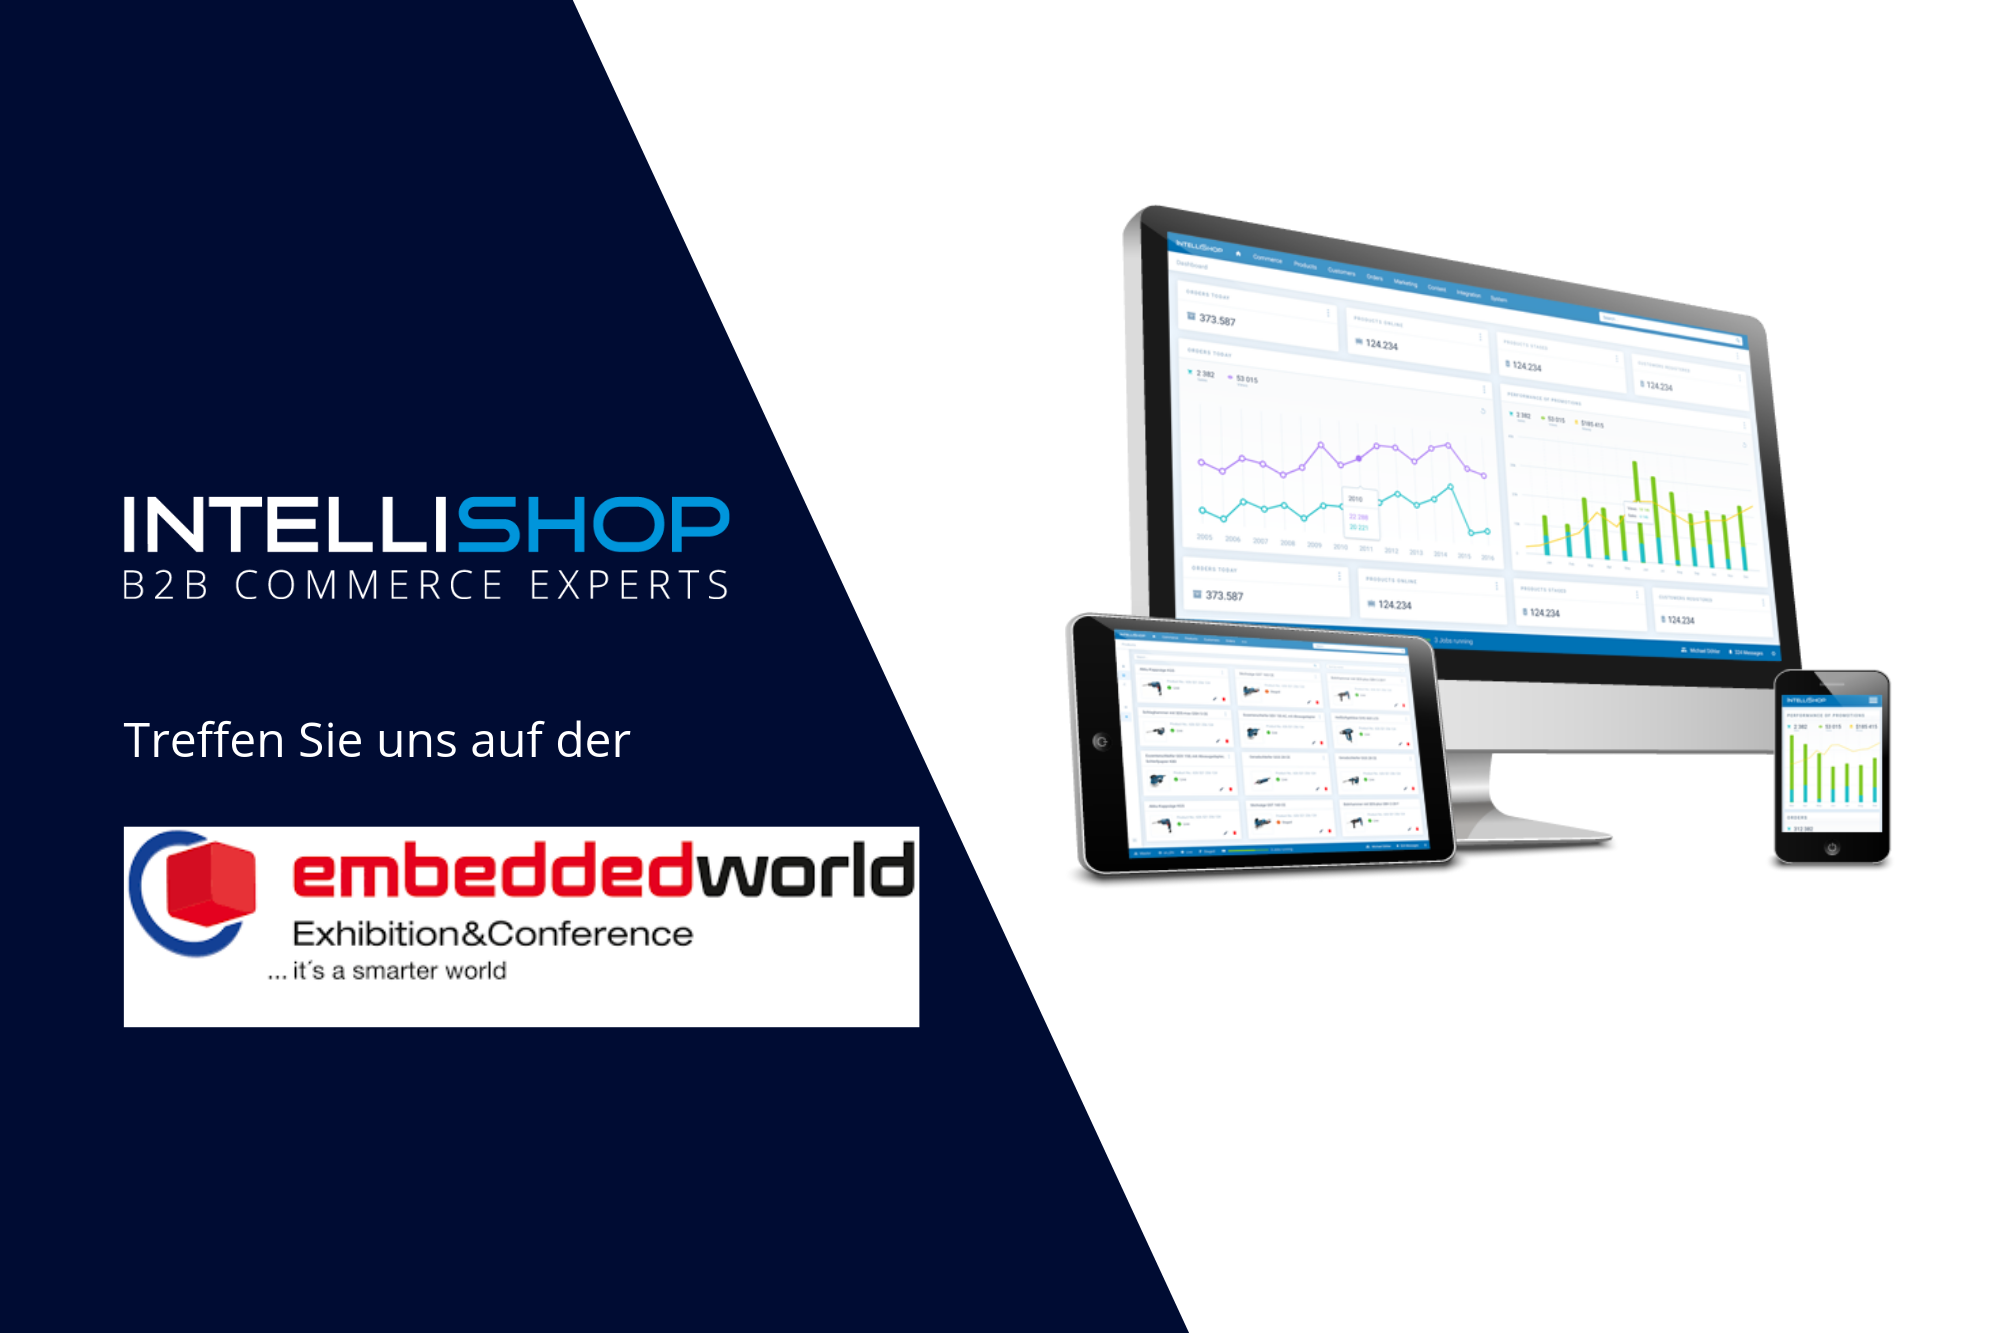 IntelliShop-Messe-embedded world